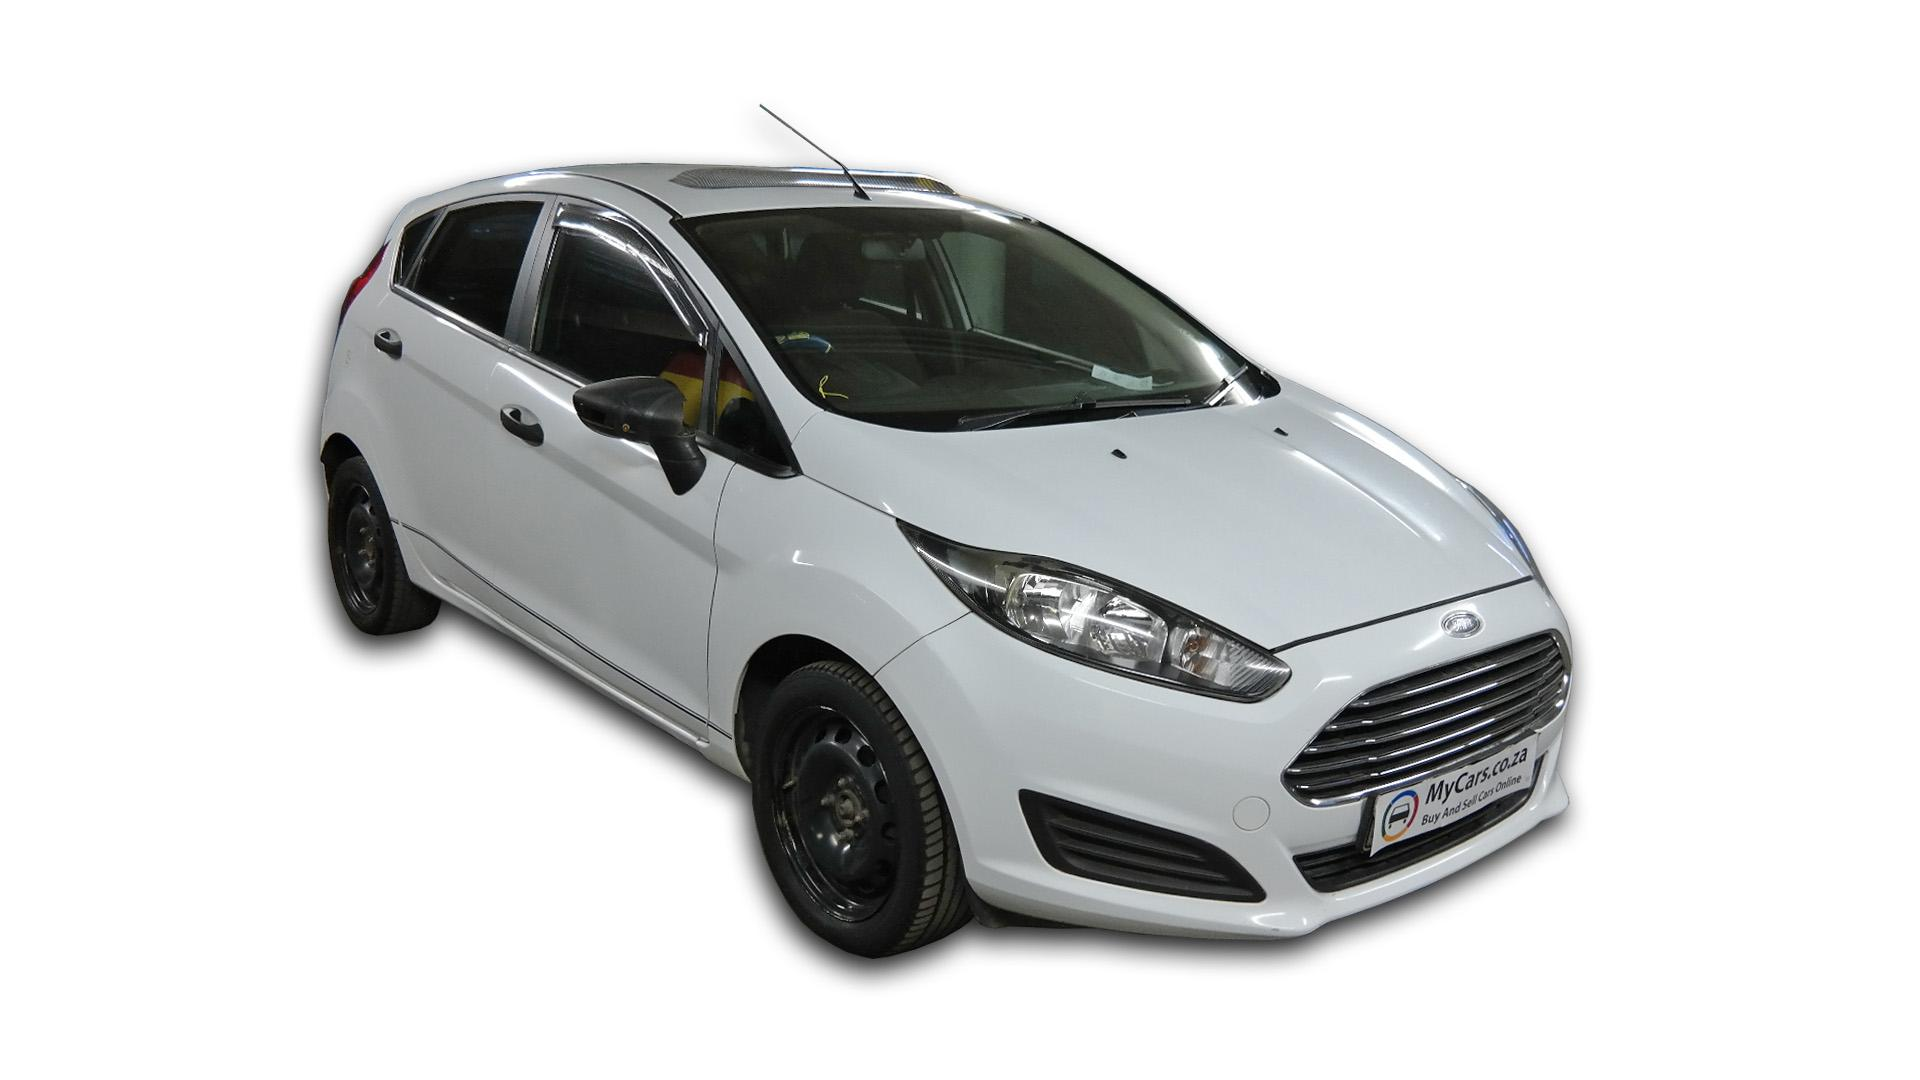 Ford Fiesta 1.4 Ambiente 5 D